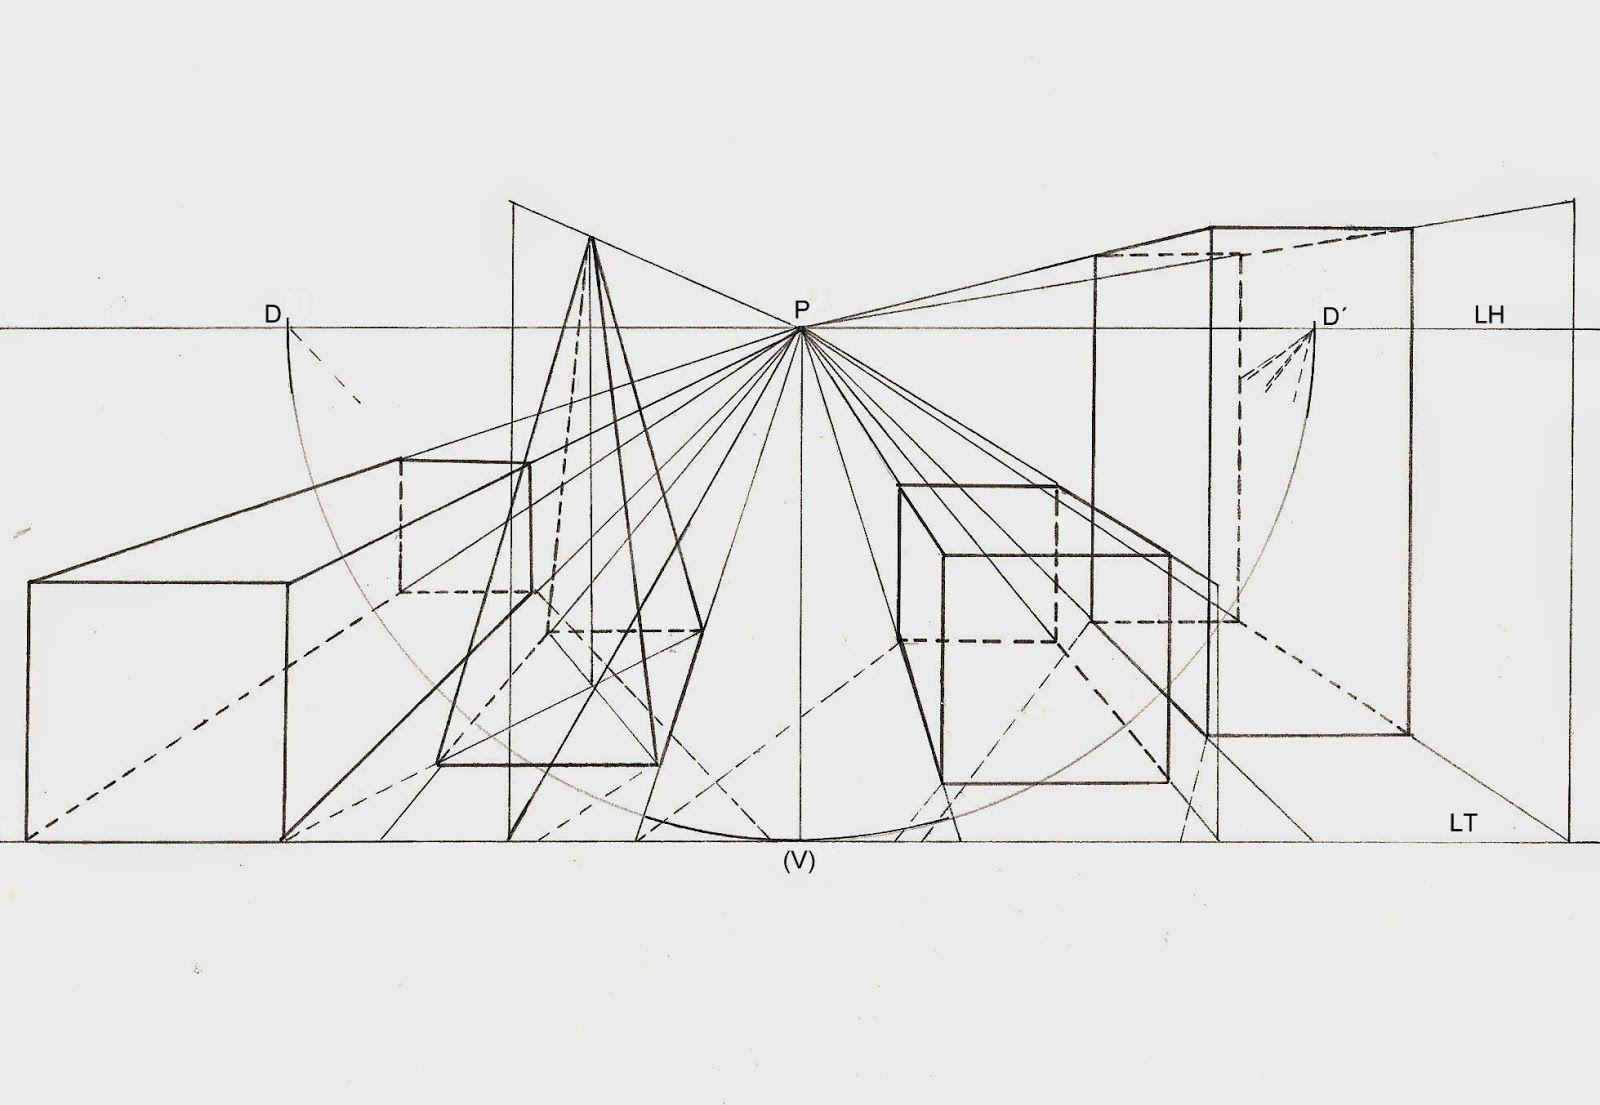 Lamina Perspectiva Conica Central Cuerpos Geometricos Perspectiva Perspectiva Central Tecnicas De Dibujo